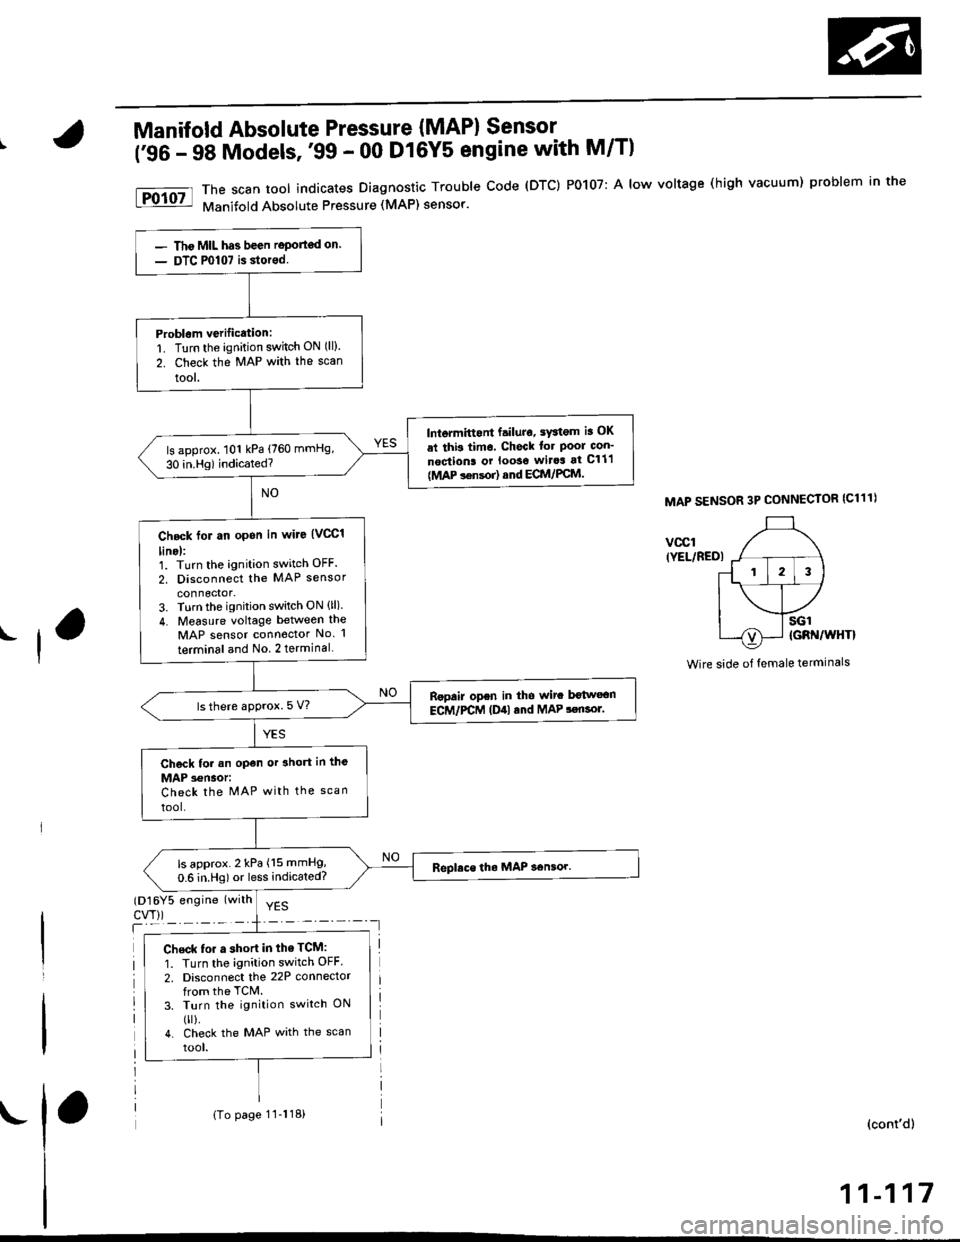 honda civic 1998 6 g workshop manual, page 386  manifold absolute pressure { map} sensor